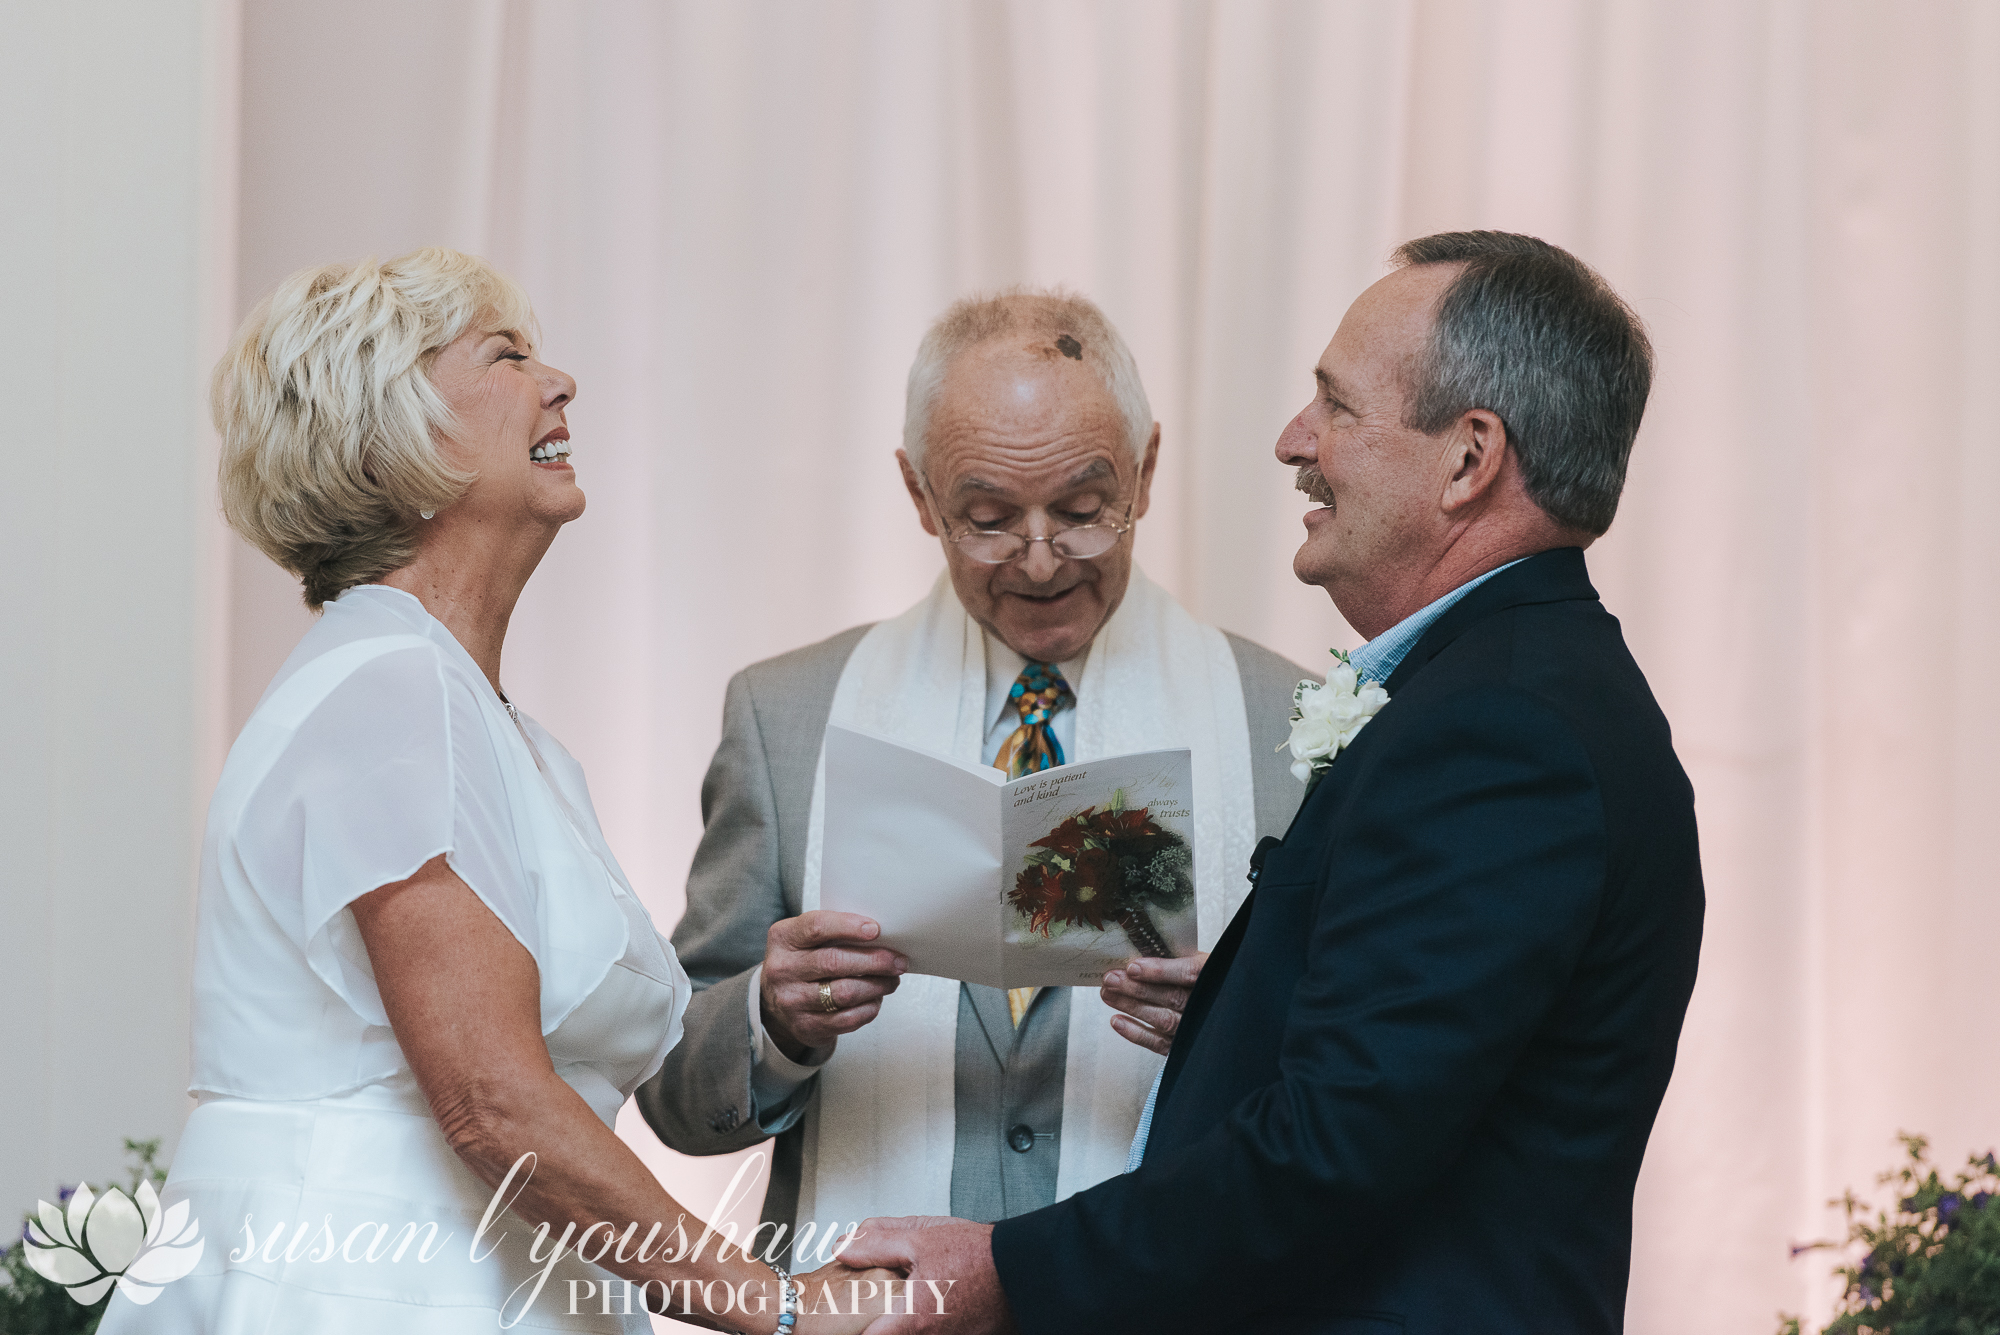 BLOG Carolyn Adams and Jim McCune 07-04-2018 SLY Photography-78.jpg